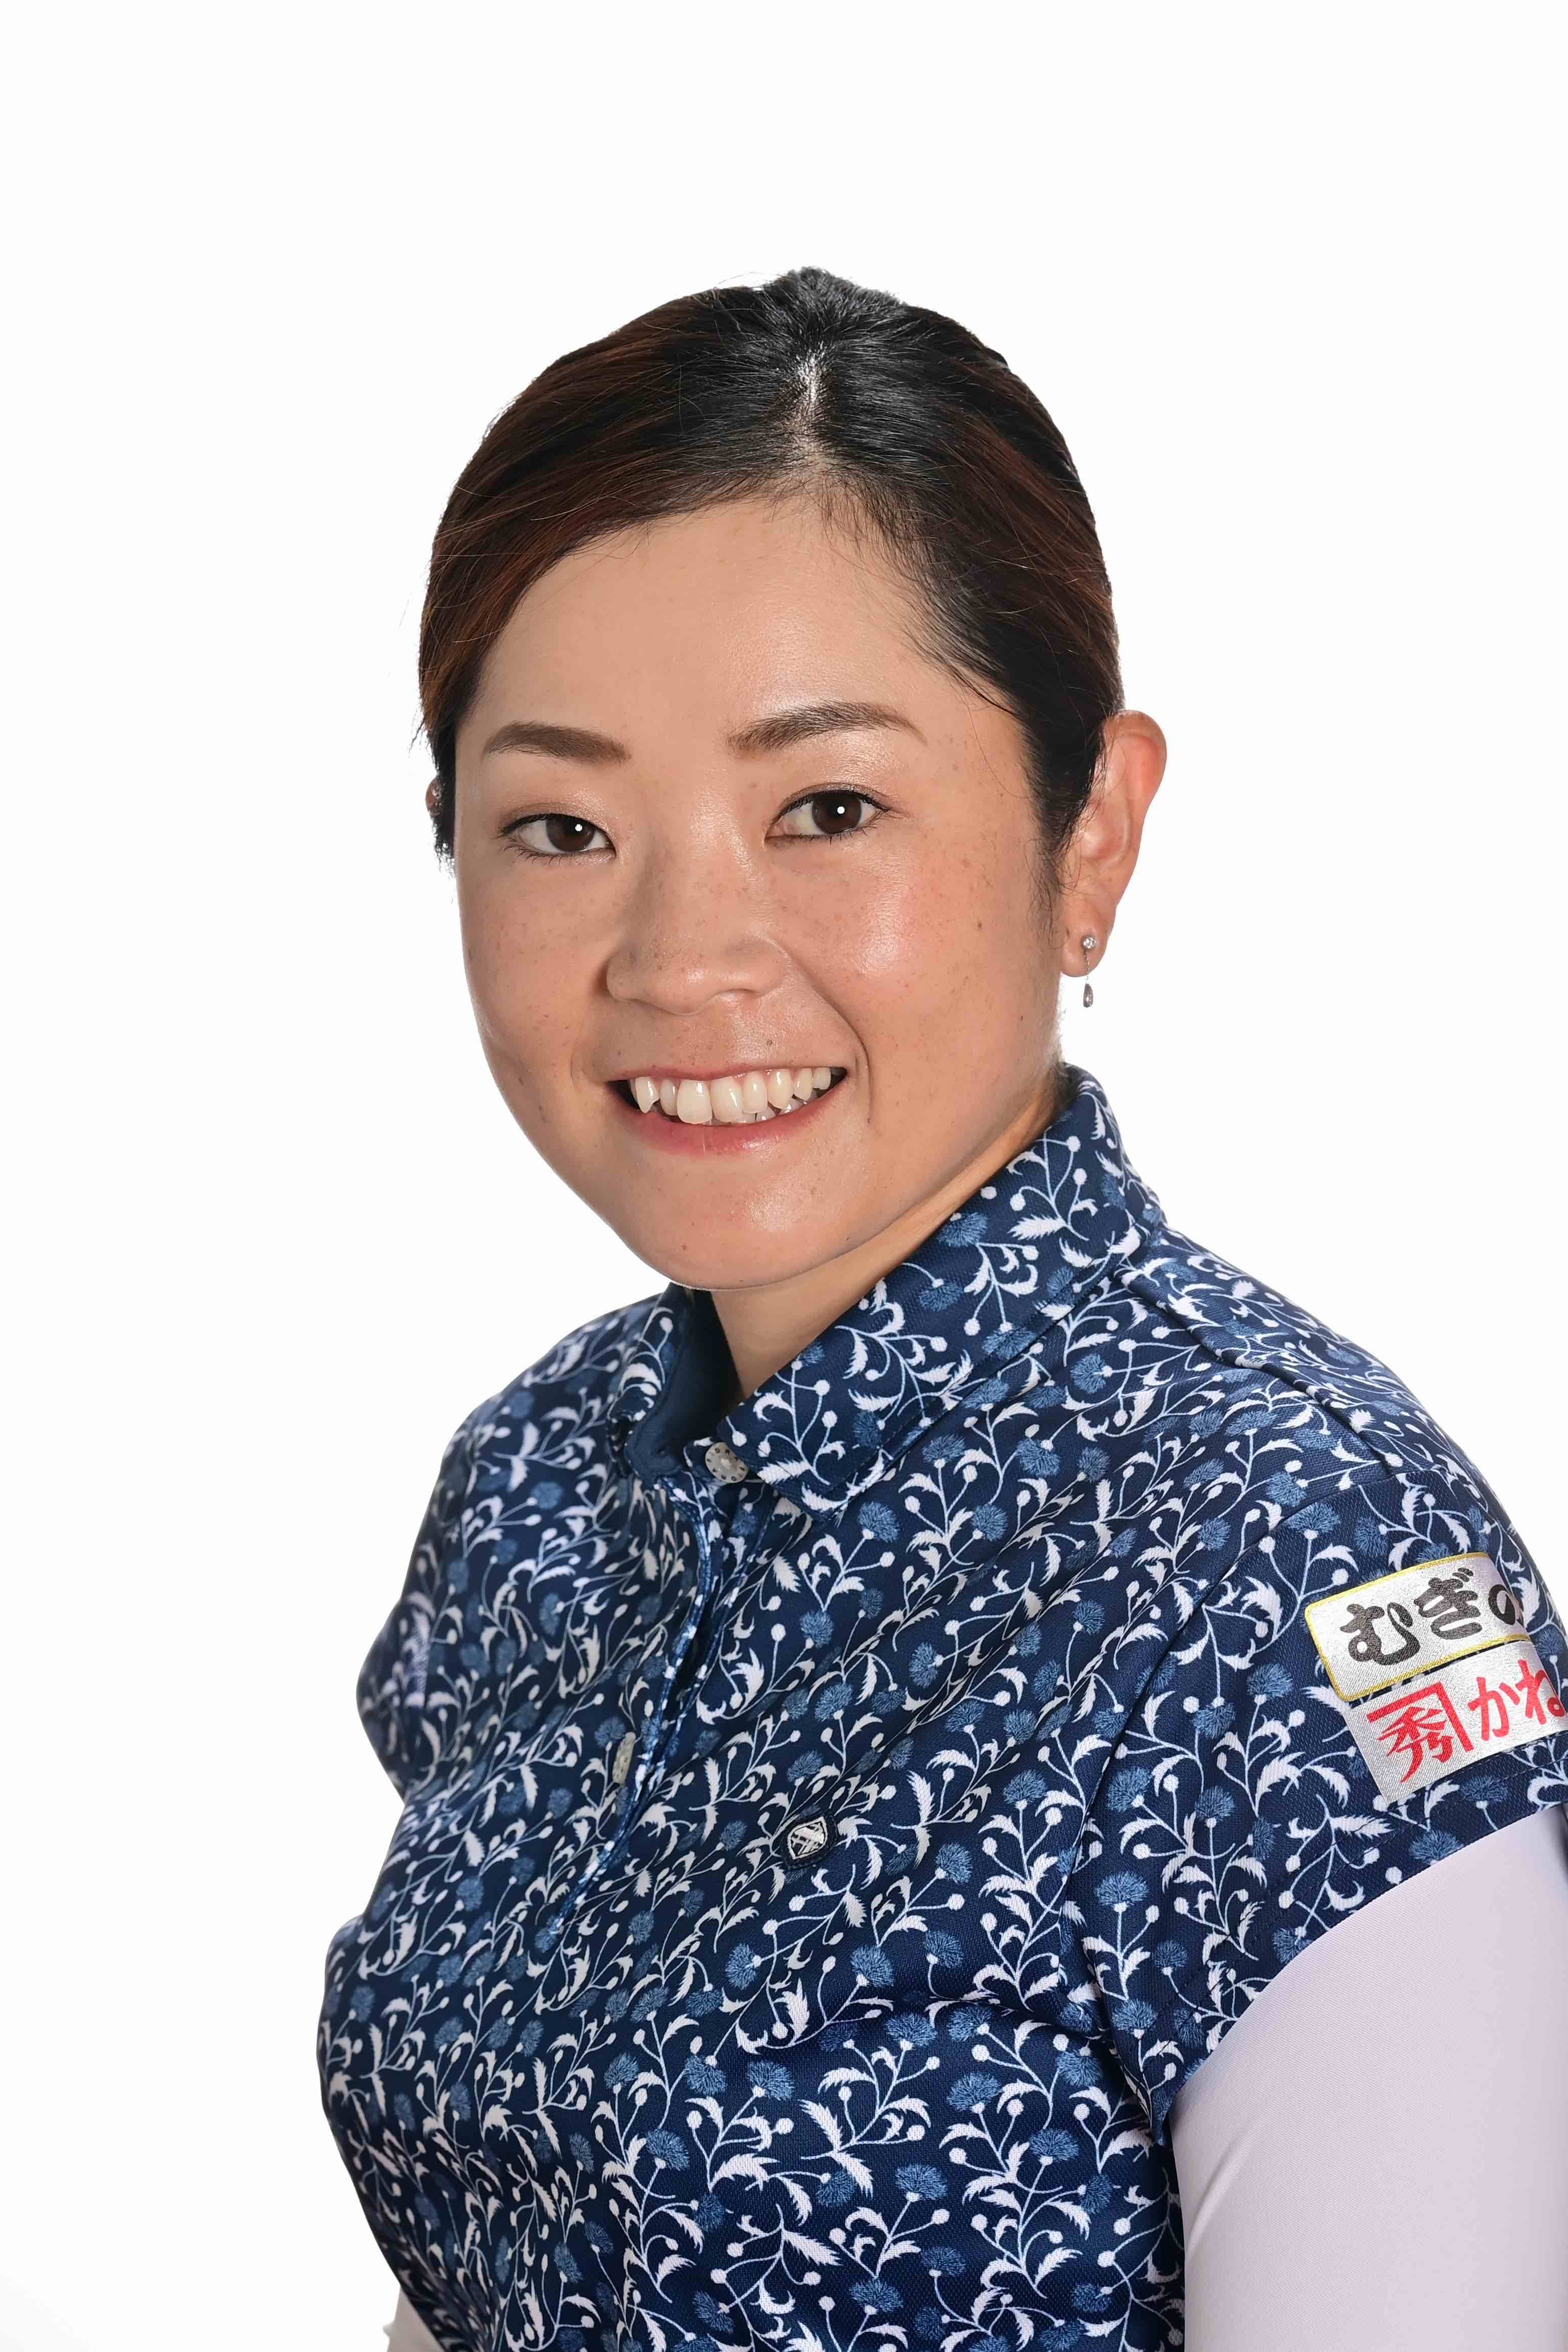 【JLPGA公式】仲宗根 澄香 選手(ゴルフボール1スリーブ①)